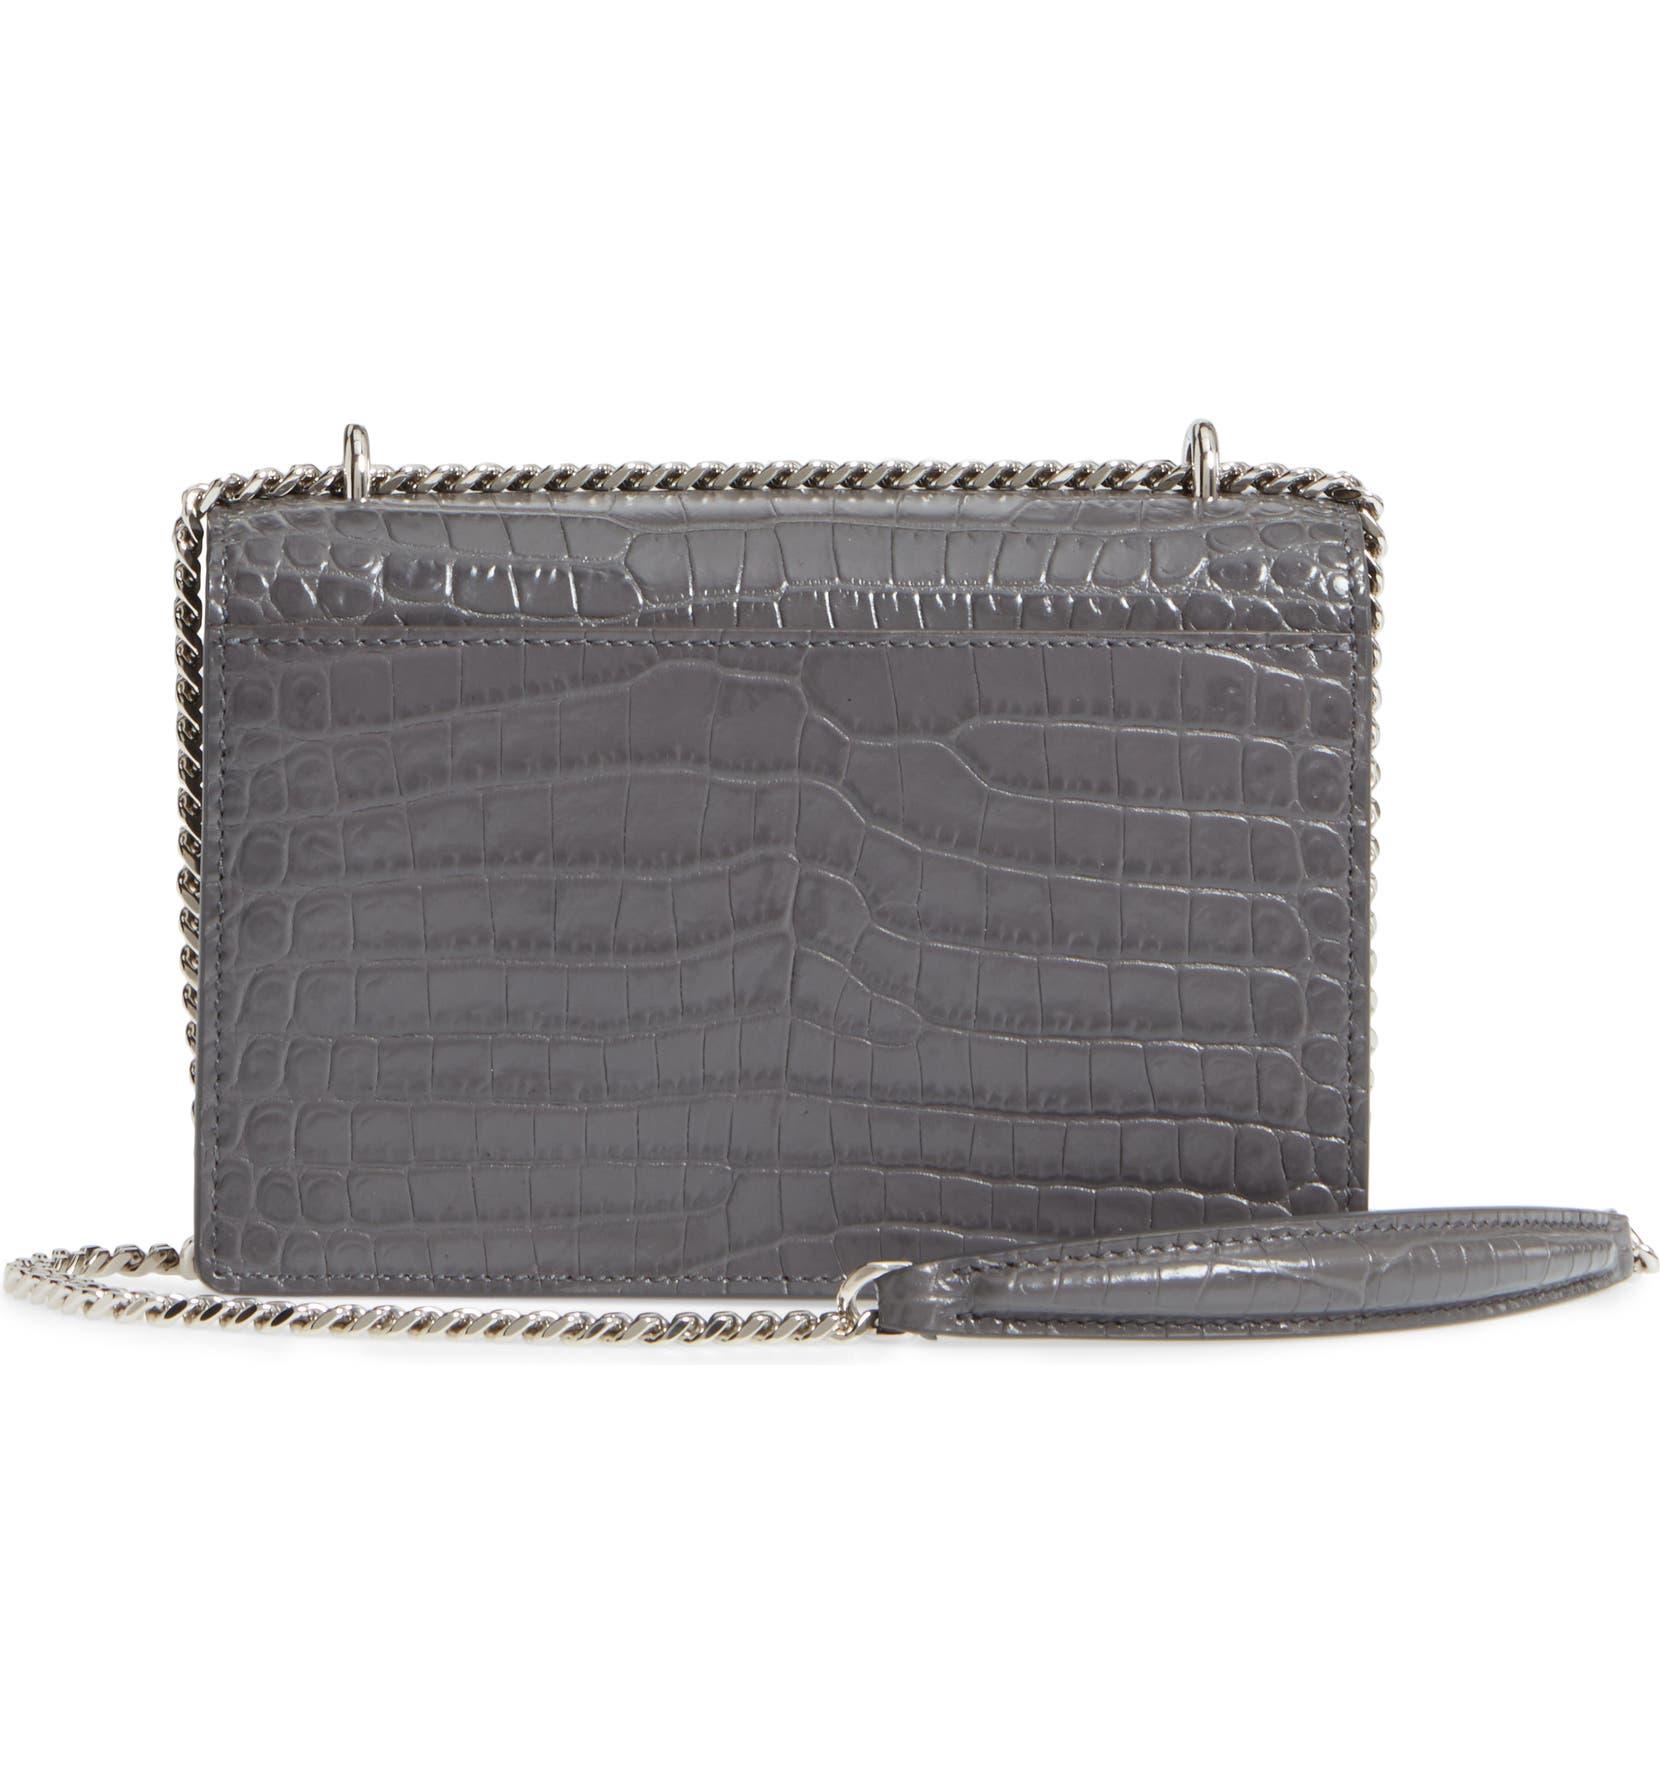 df8f6f0c6a0 Saint Laurent Mini Monogram Sunset Croc Embossed Leather Shoulder Bag |  Nordstrom